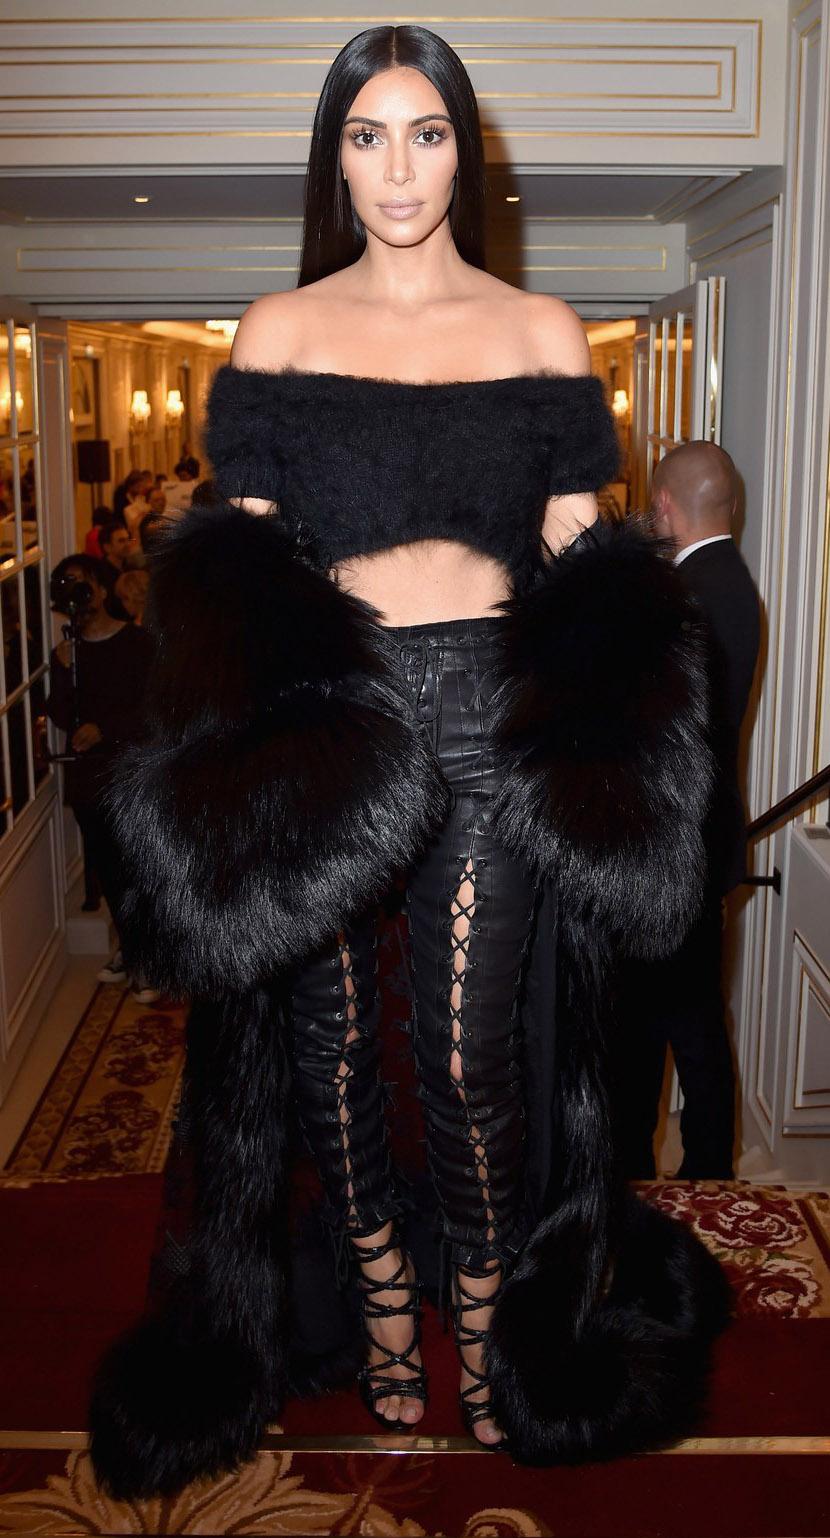 black-top-crop-black-jacket-coat-fur-maxi-oversized-leather-kimkardashian-brun-fall-winter-dinner.jpg